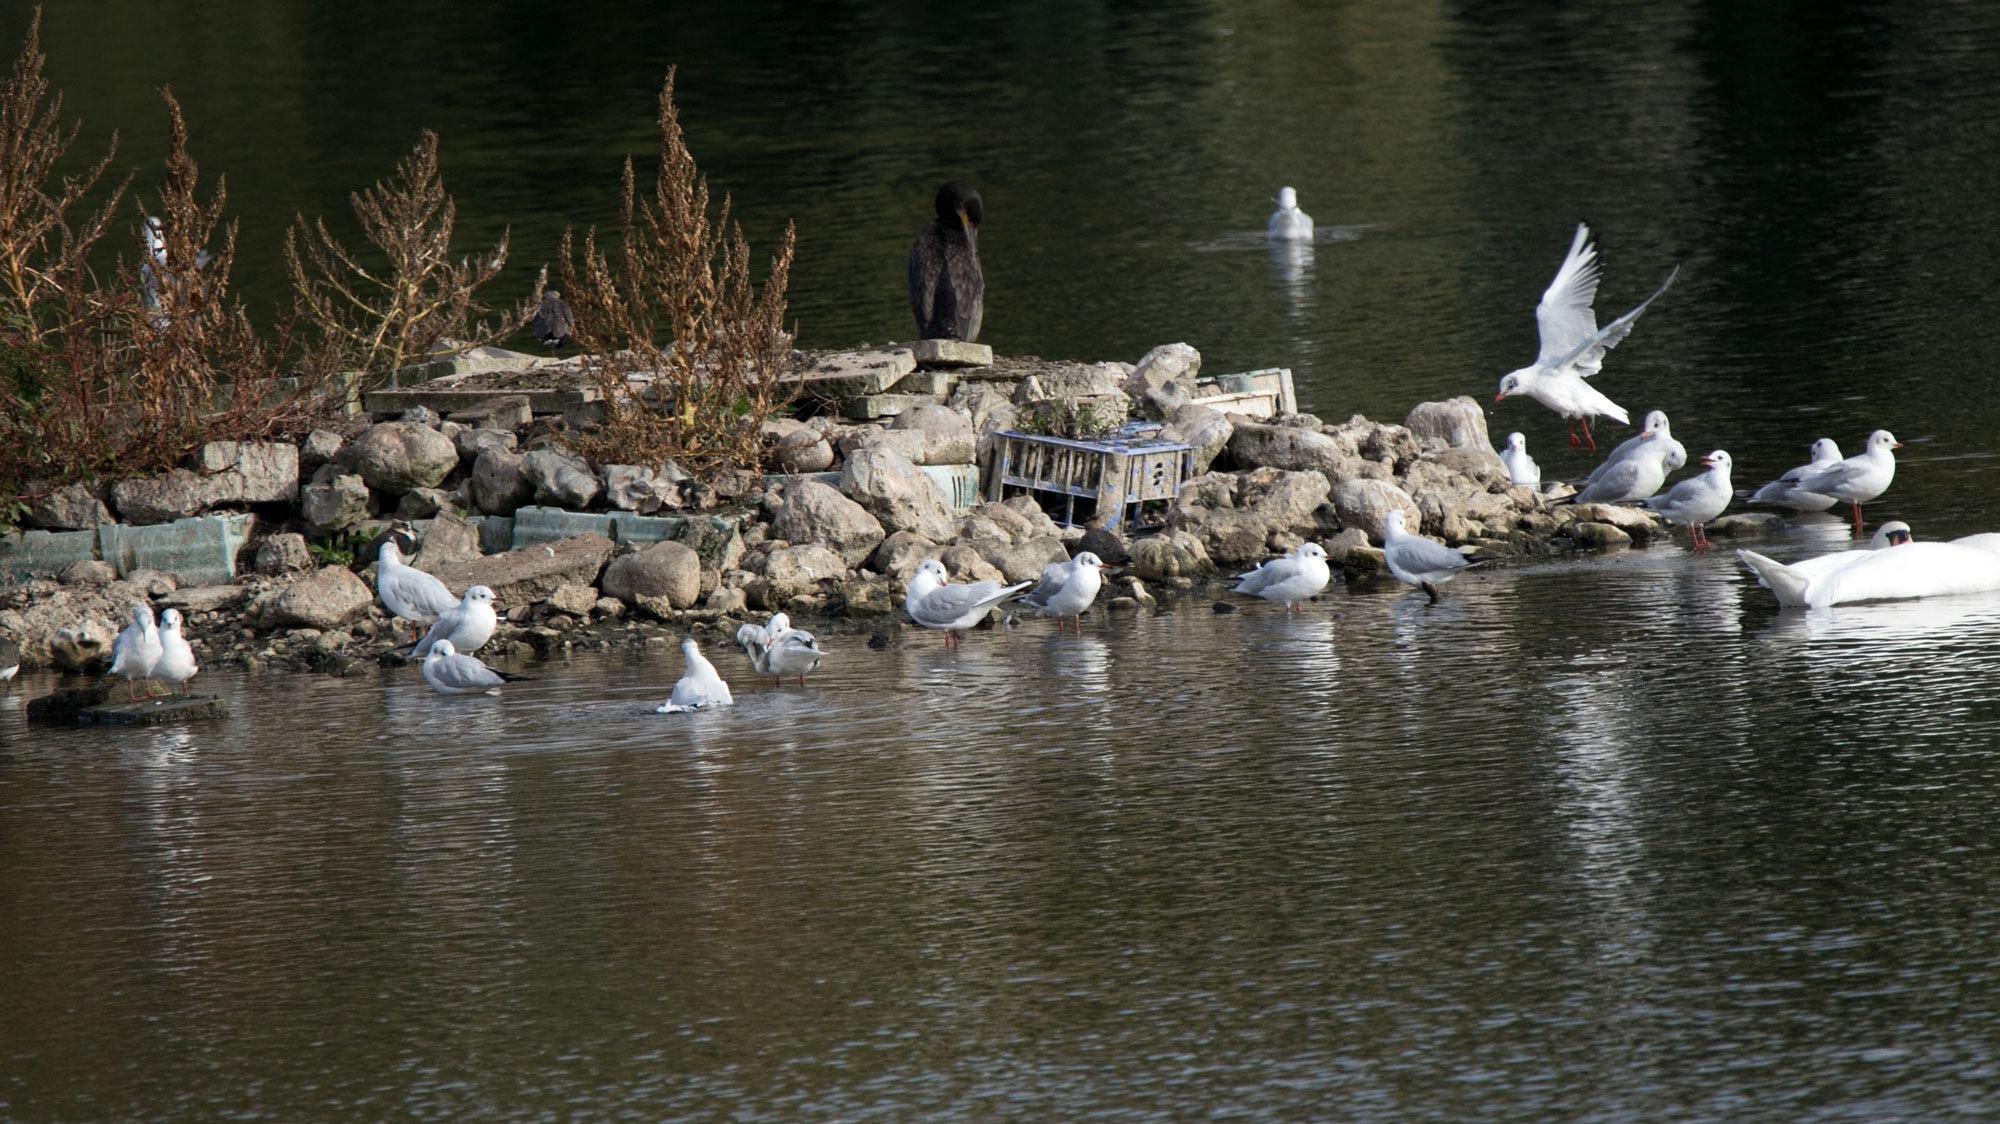 Birds on Rocks by Karen